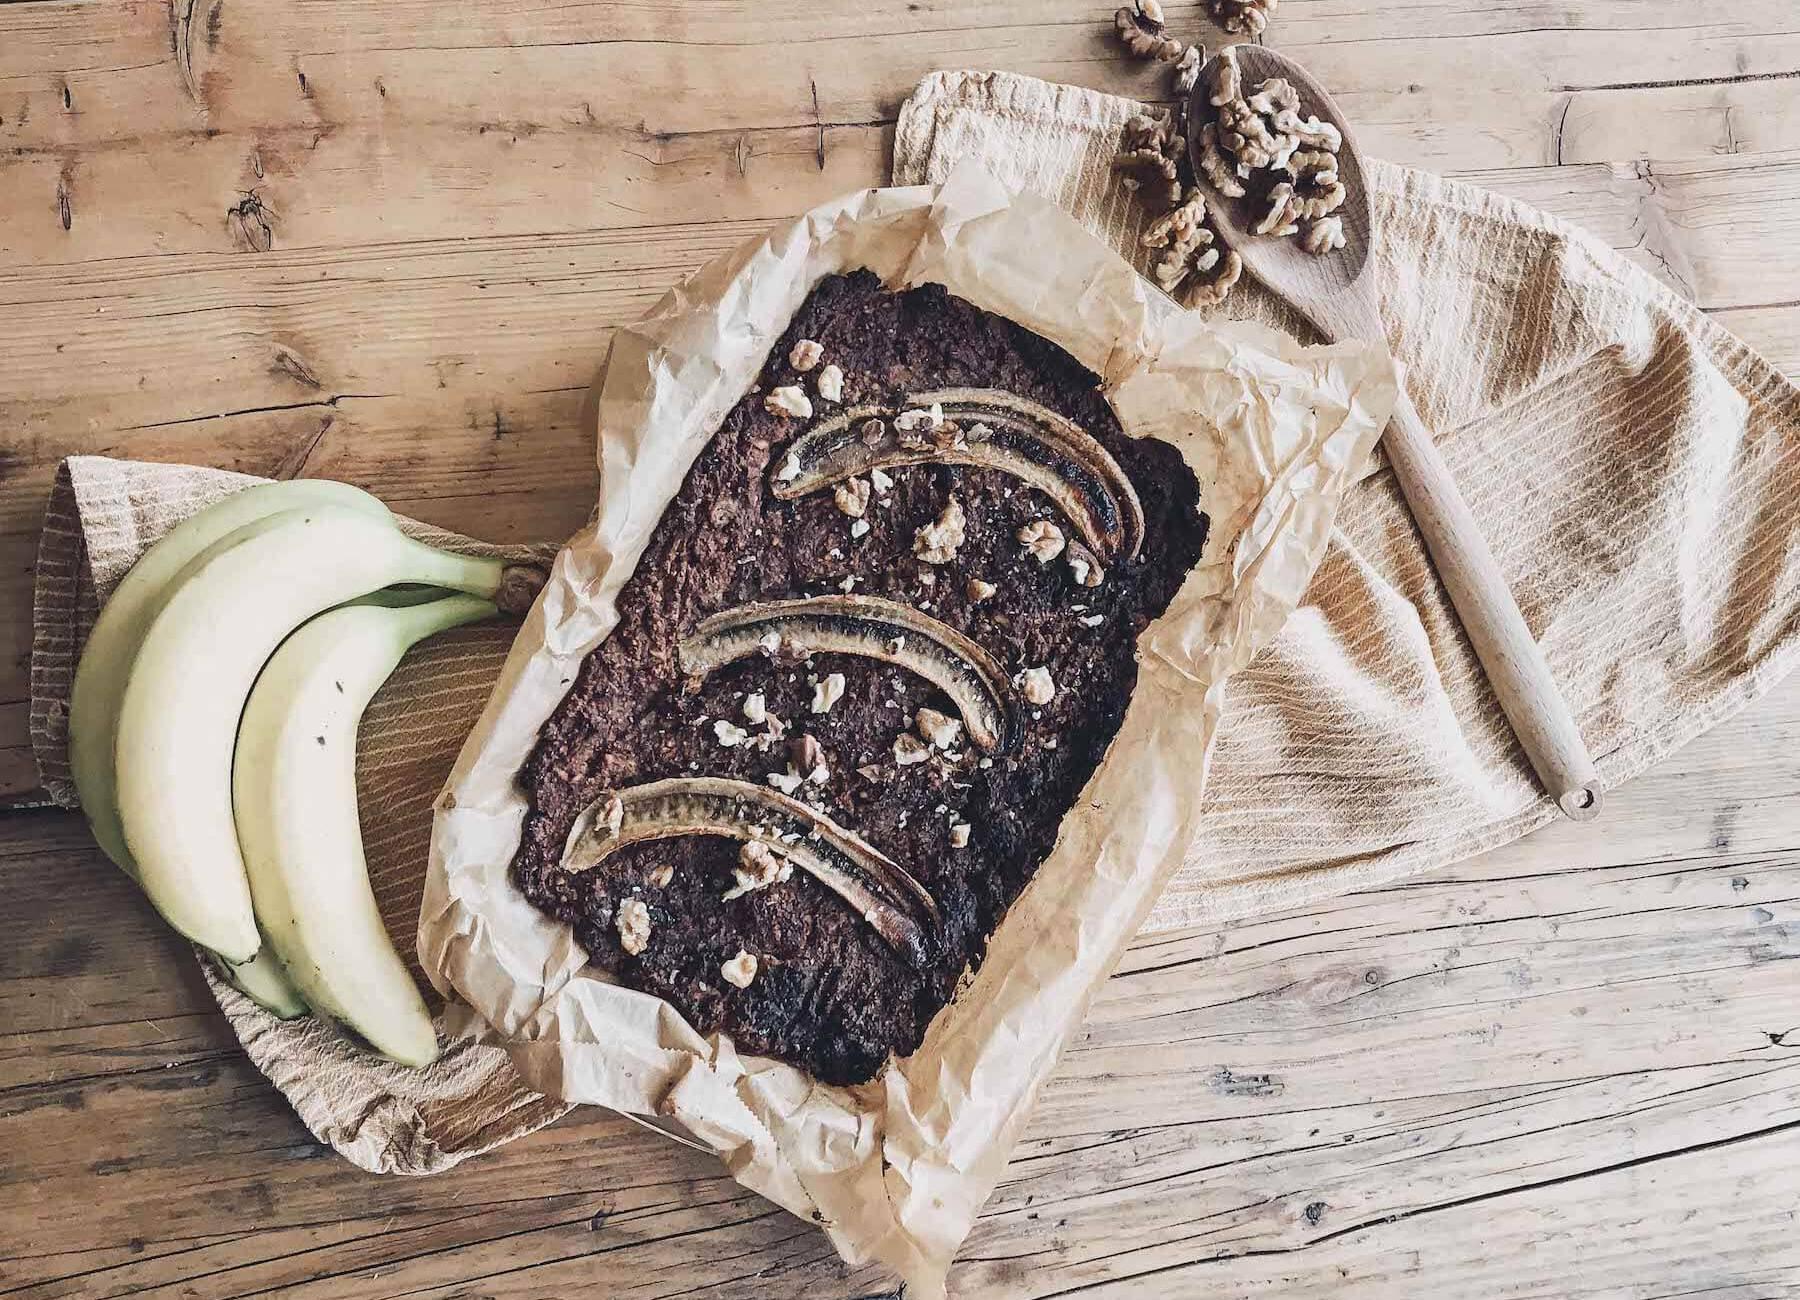 Vegan Beautyboost: Braunhirse Bananenbrot mit Cranberries